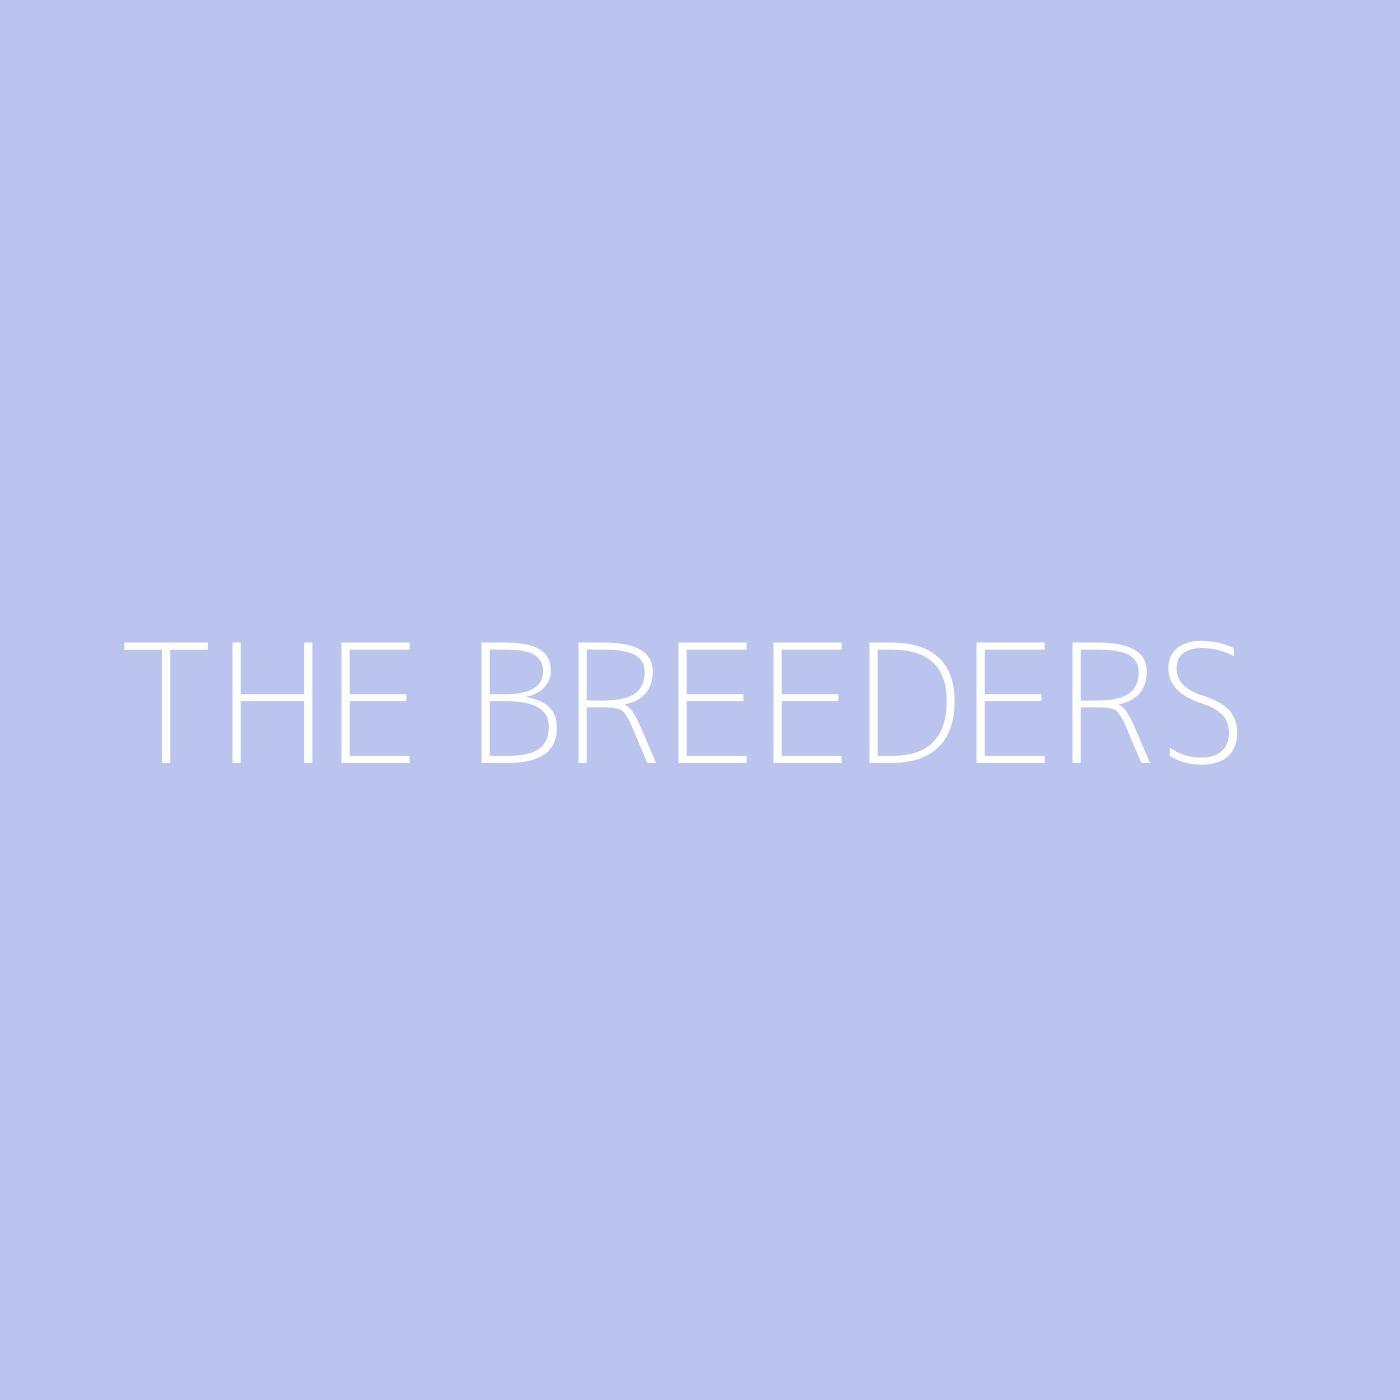 The Breeders Playlist Artwork